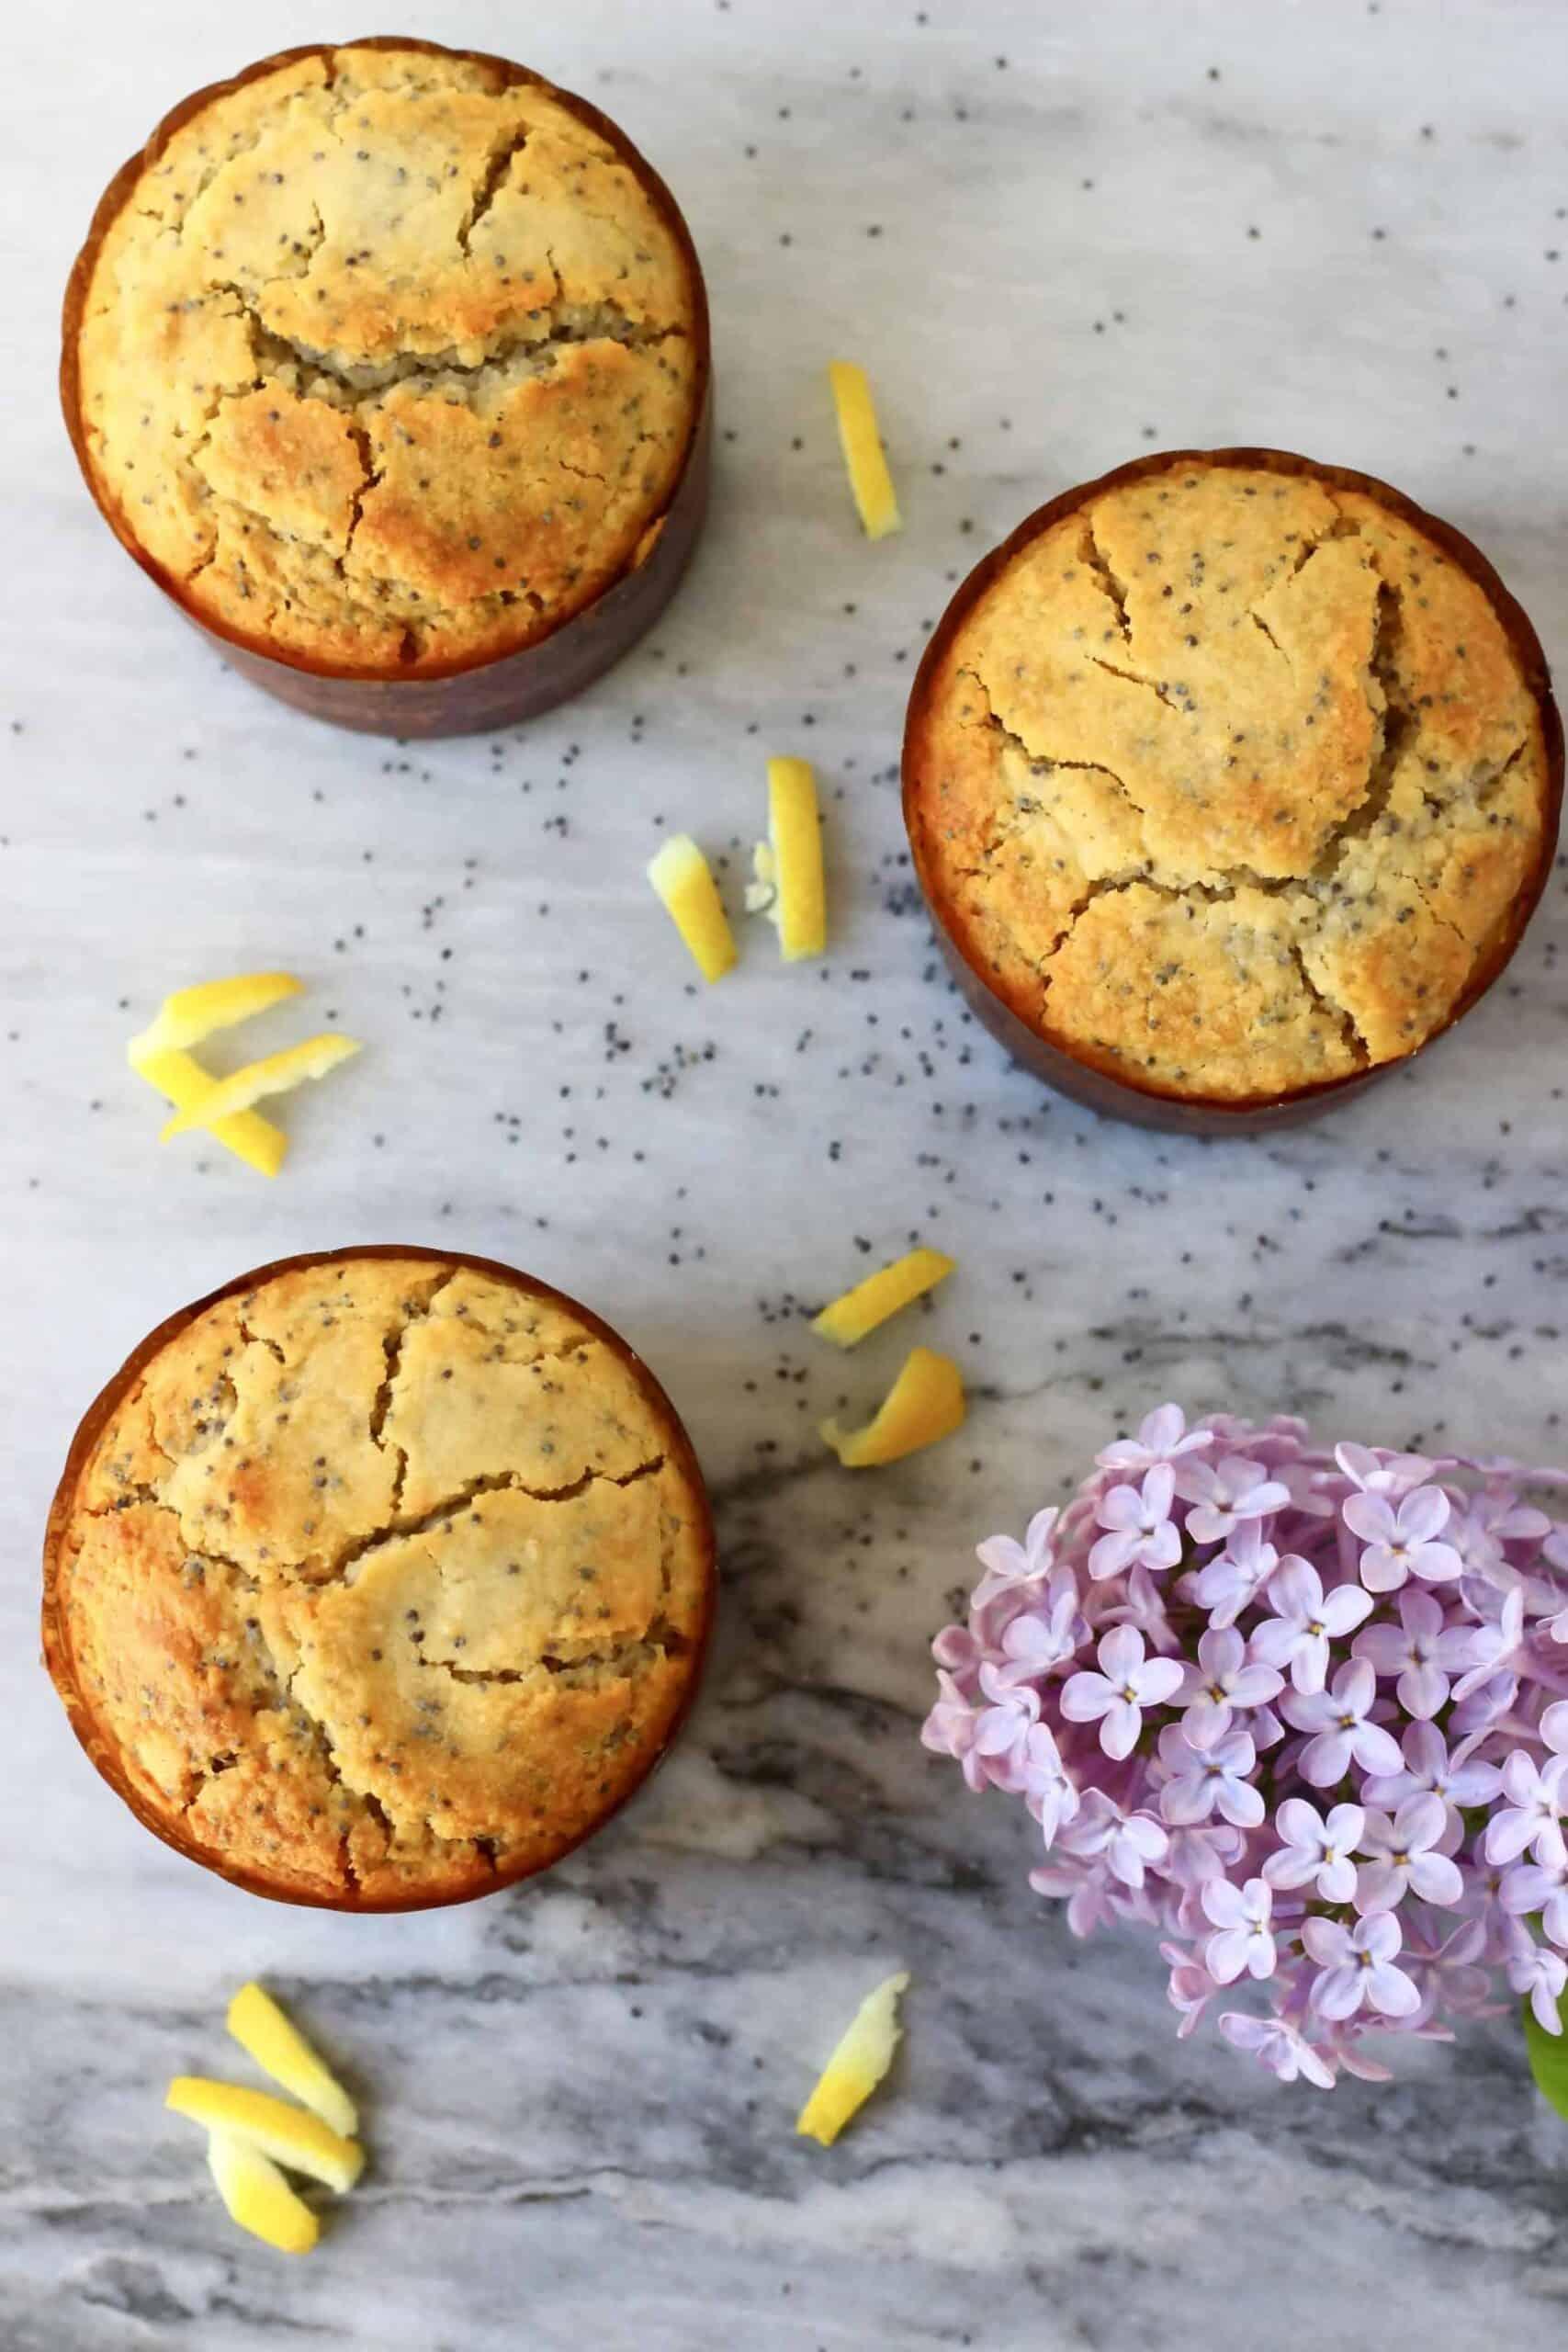 Three gluten-free vegan lemon poppy seed muffins in brown muffin cases